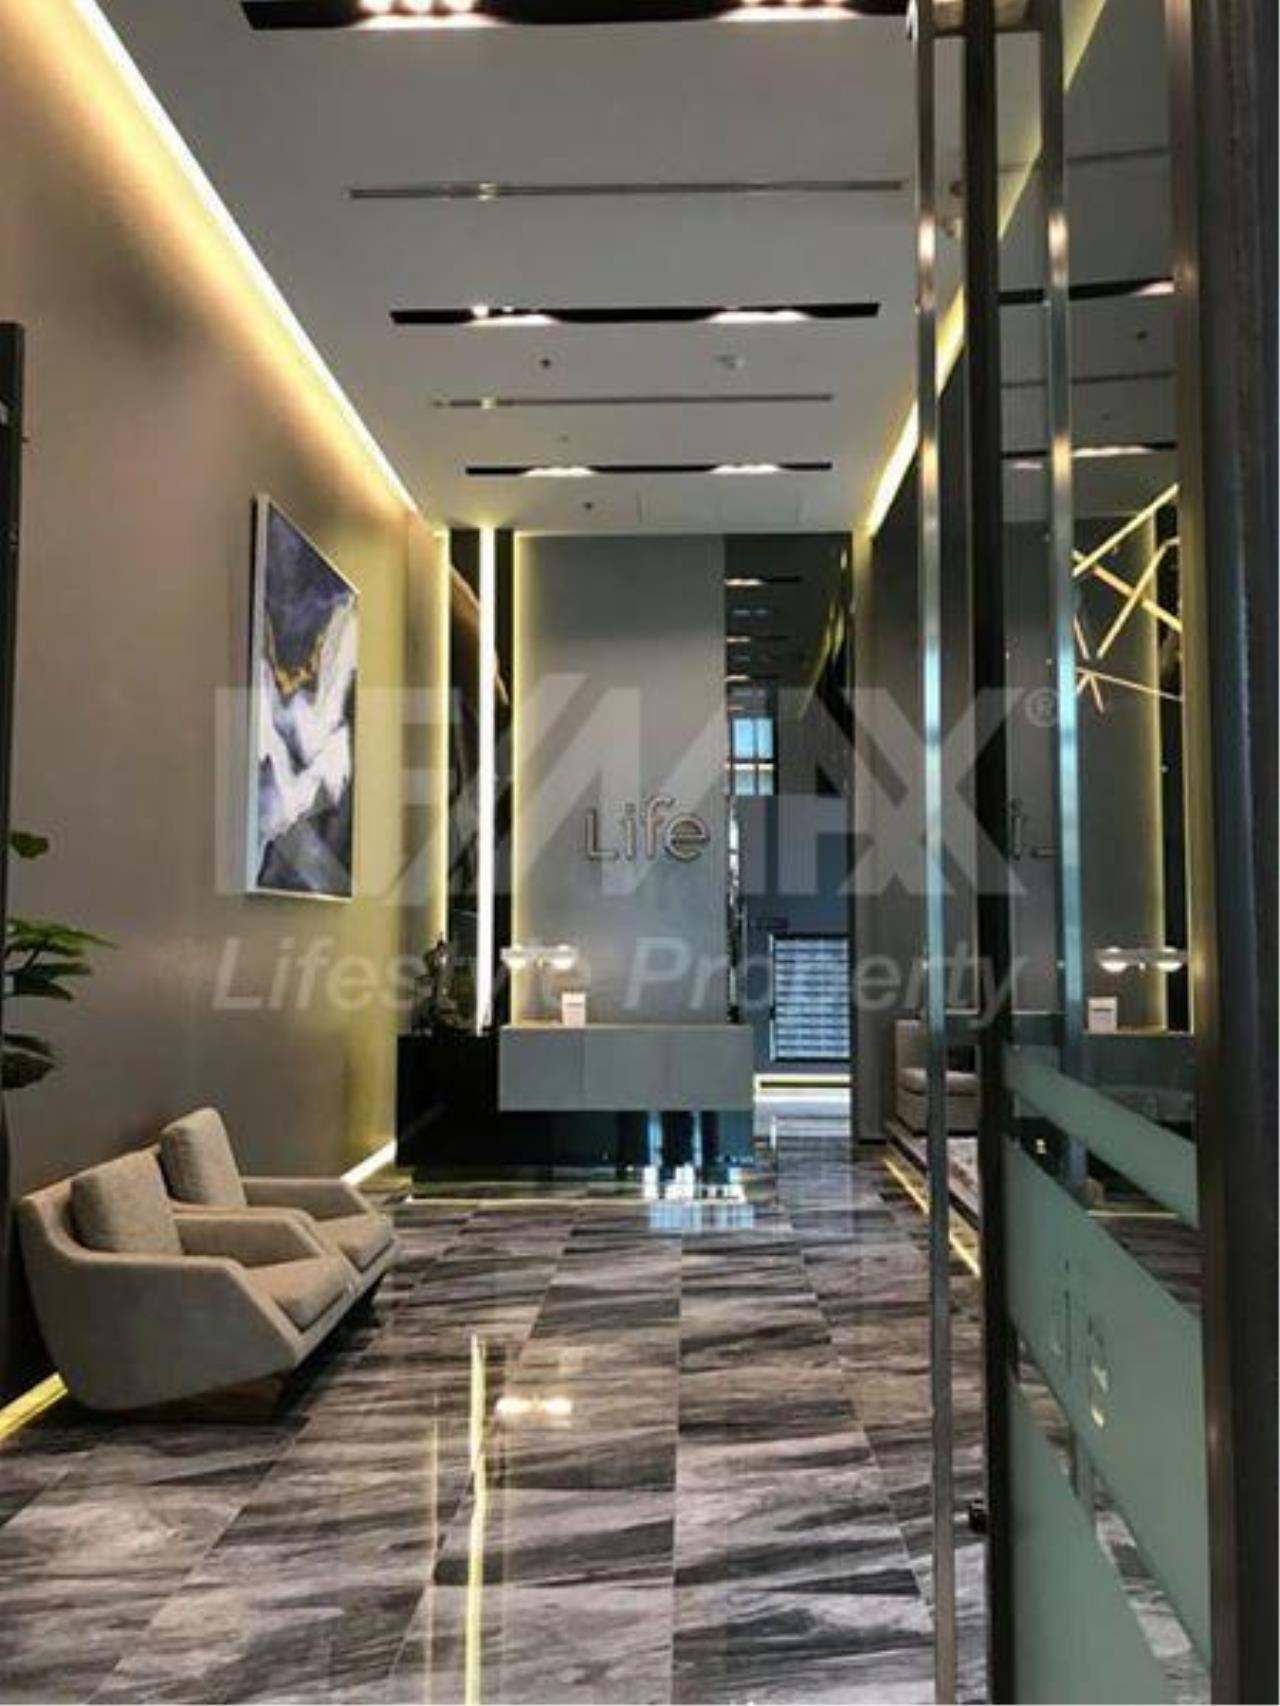 RE/MAX LifeStyle Property Agency's Life Sukhumvit 48 5